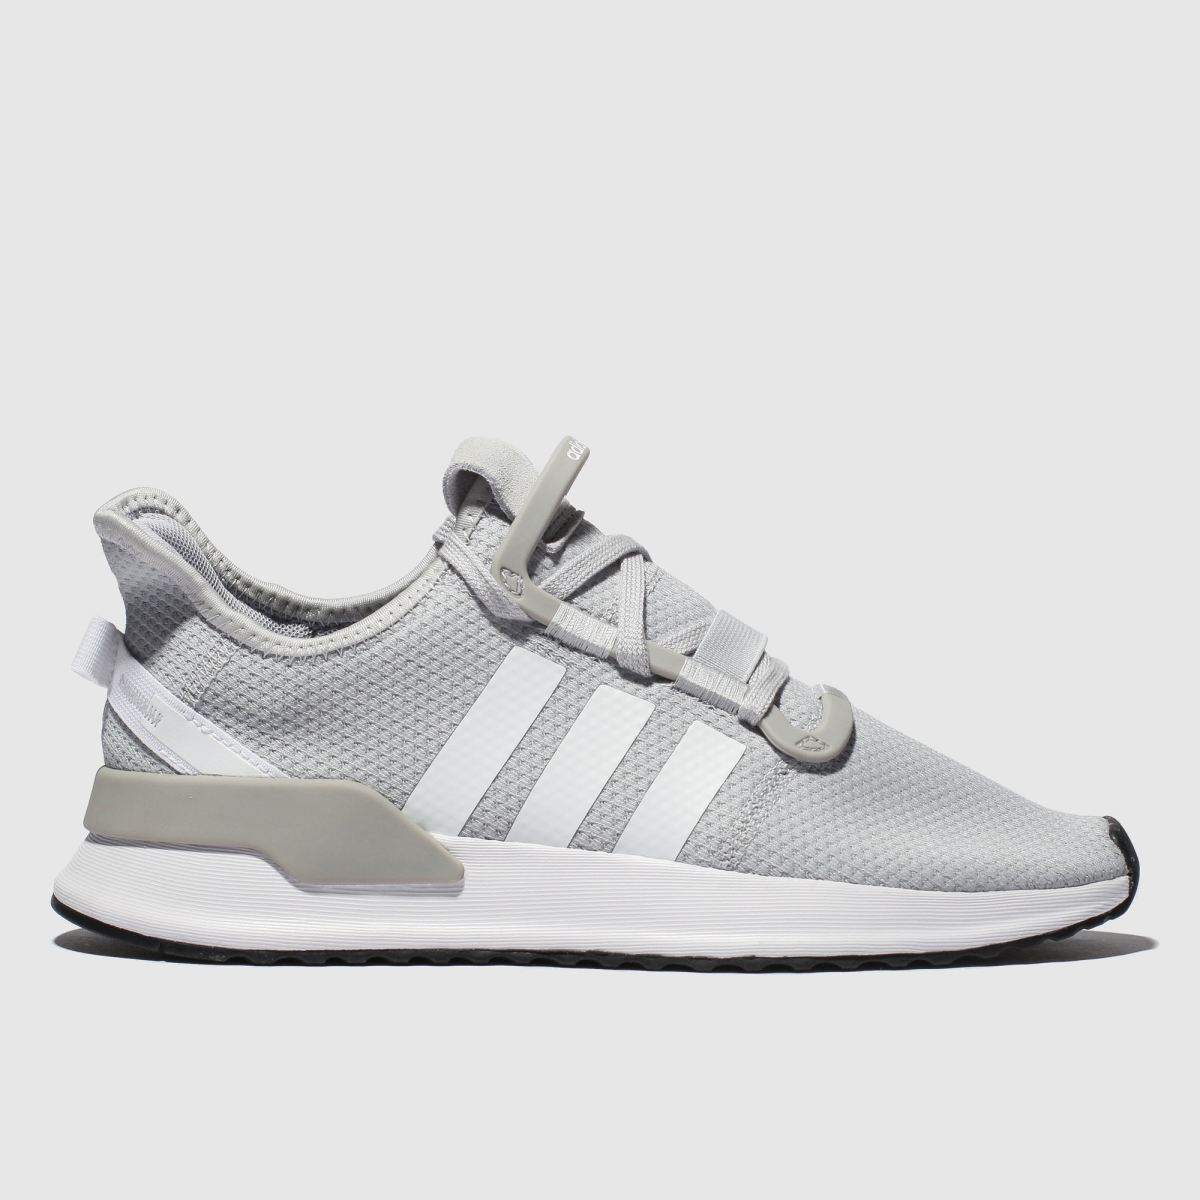 Adidas Light Grey U_path Trainers